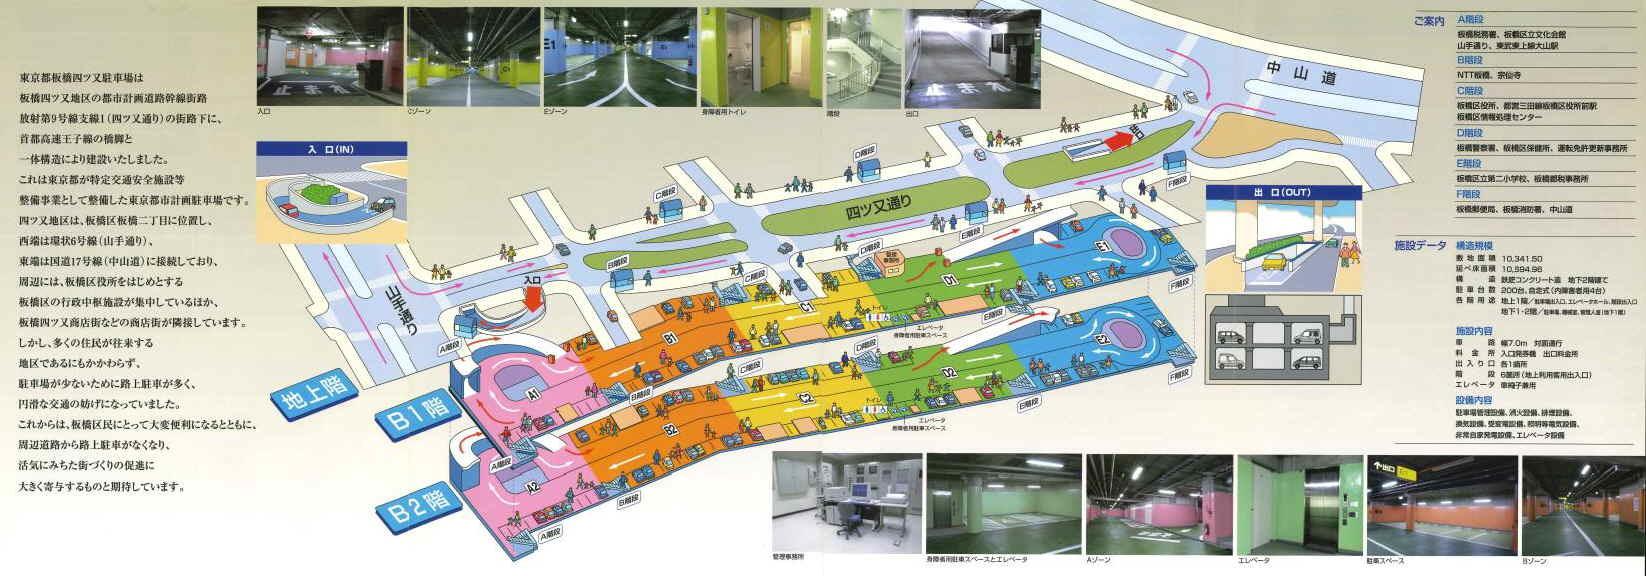 東京都板橋四ッ又駐車場の指定管理者の指定_f0059673_18283546.jpg